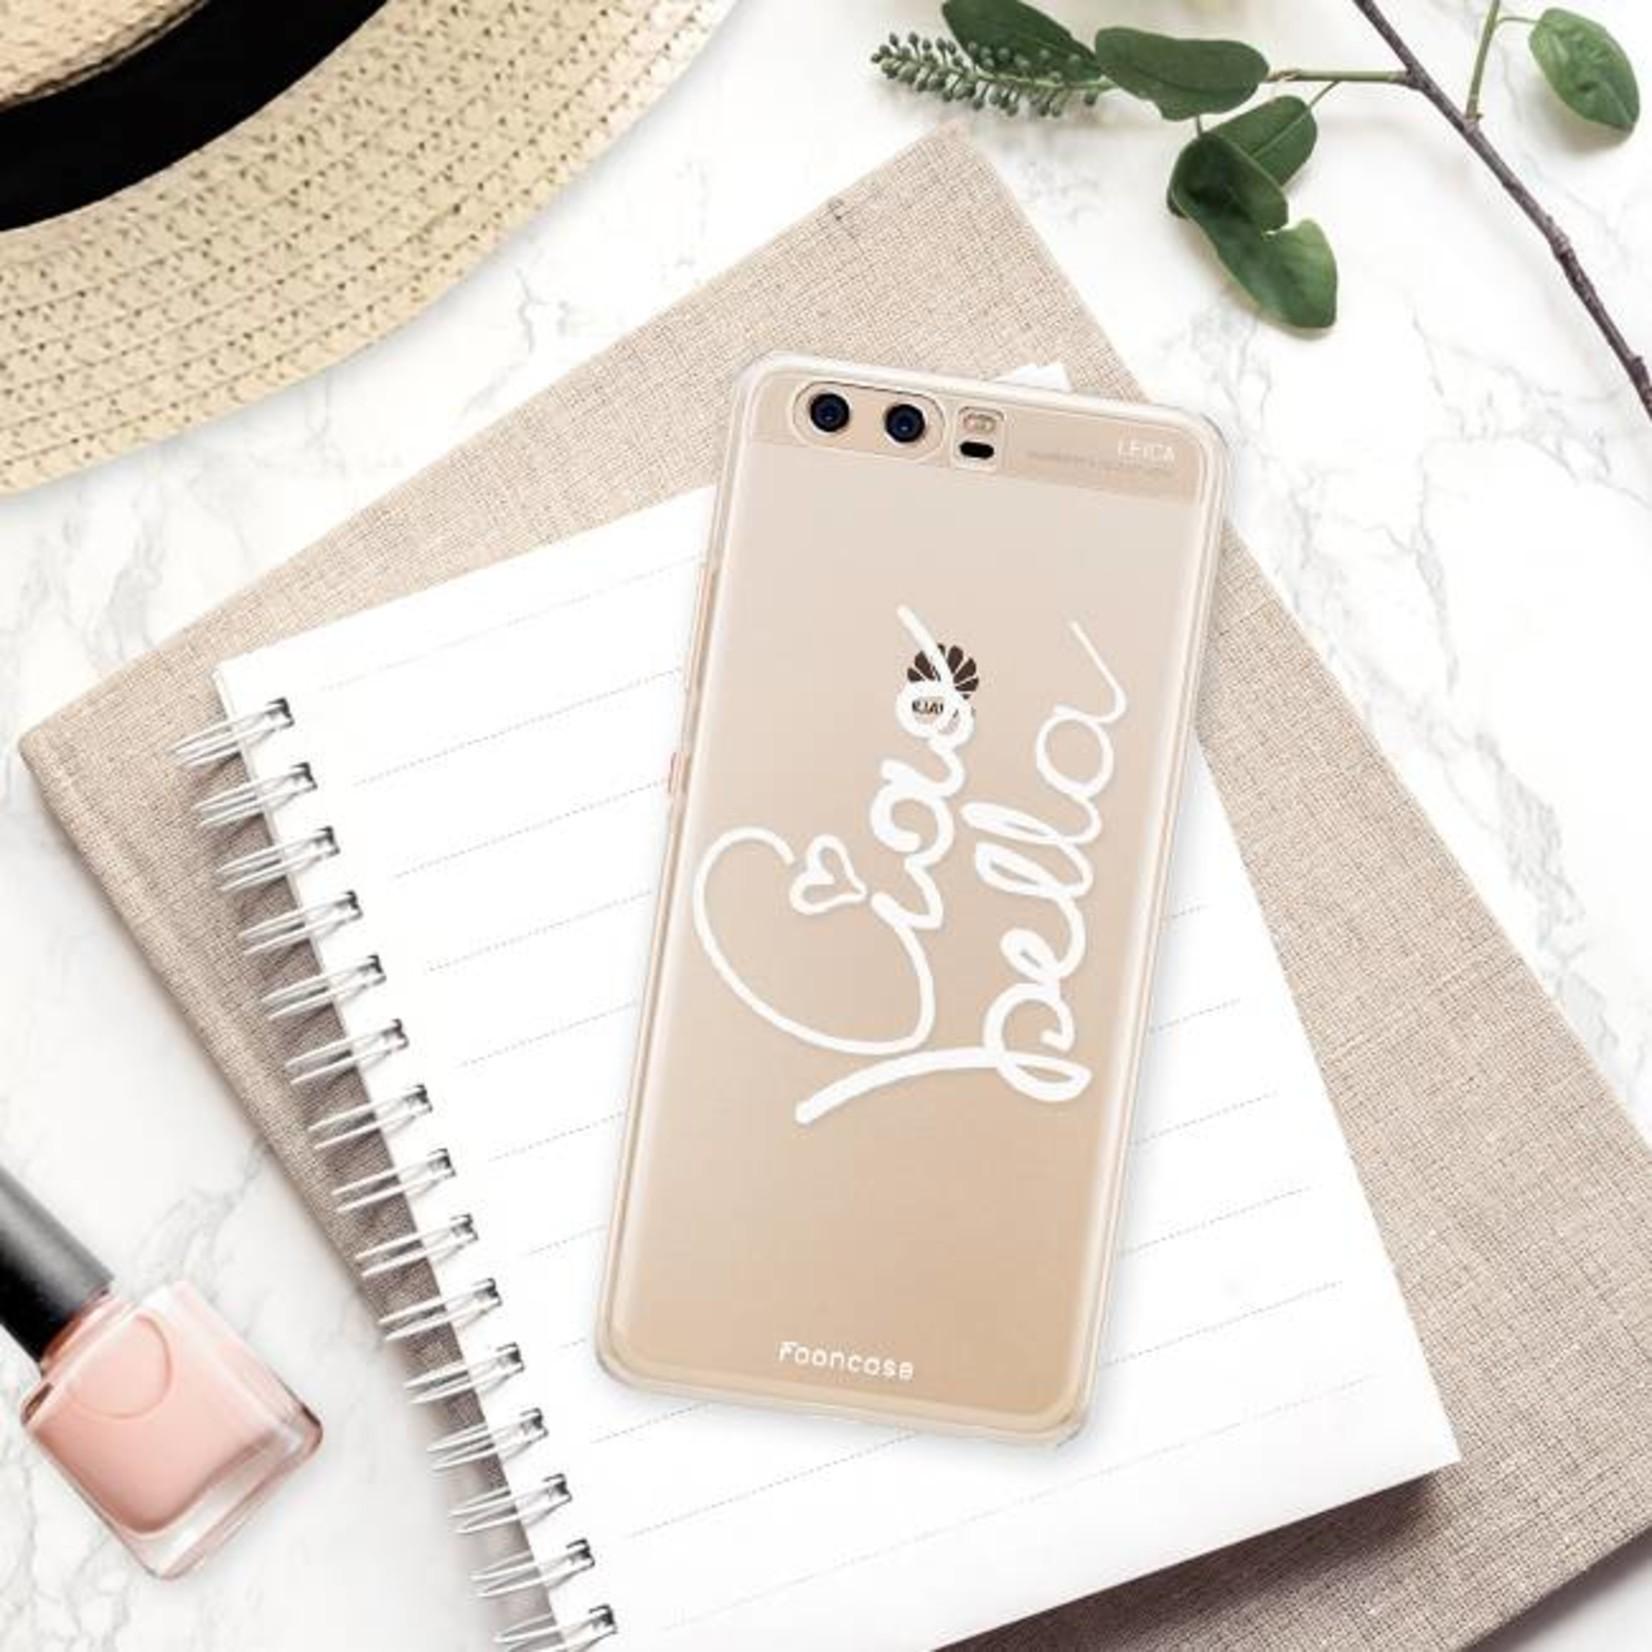 FOONCASE Huawei P10 Handyhülle - Ciao Bella!